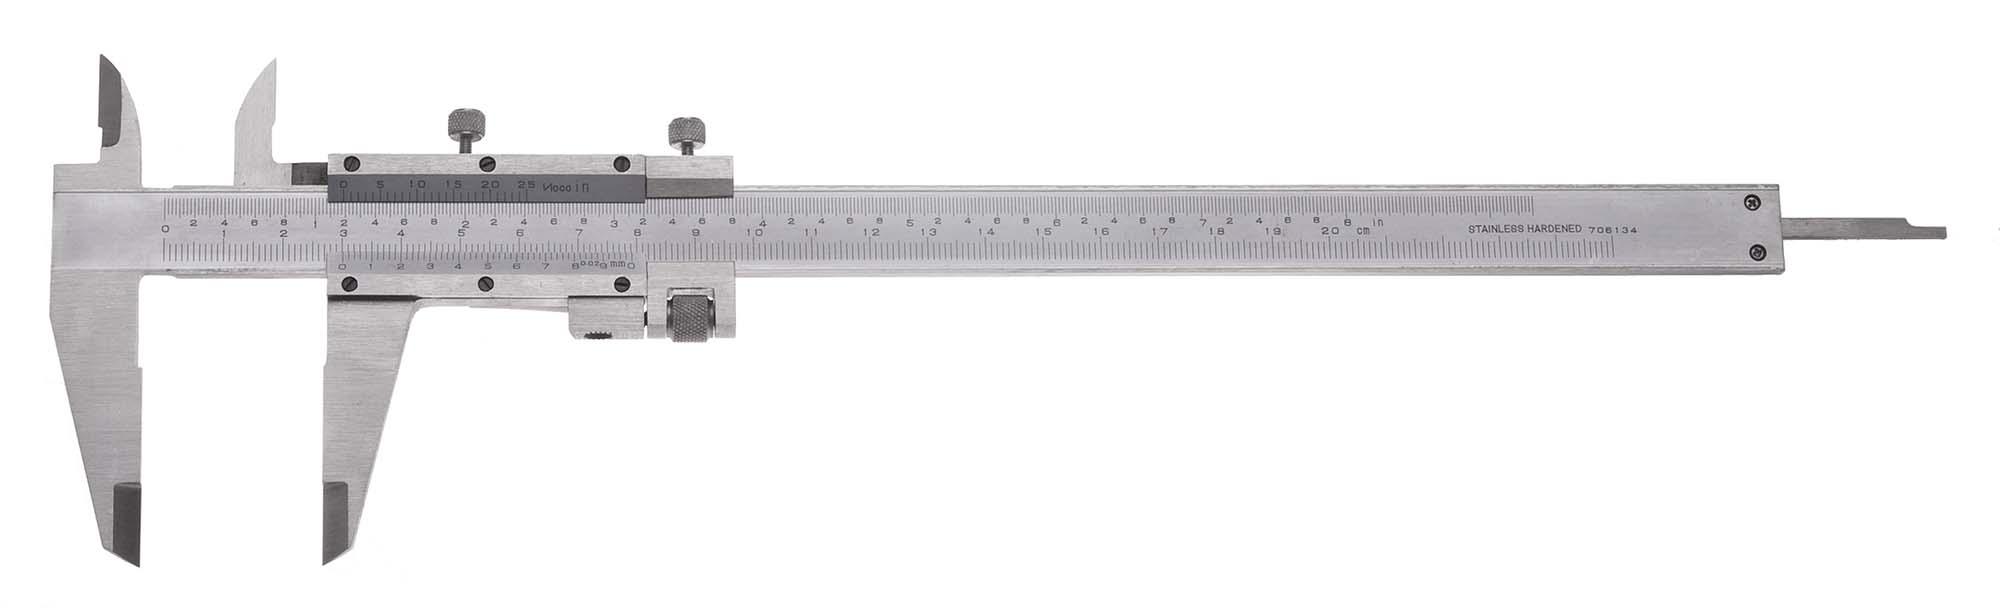 "8"" VME Vernier Caliper with Fine Adjustment, .001"", 1/50mm"